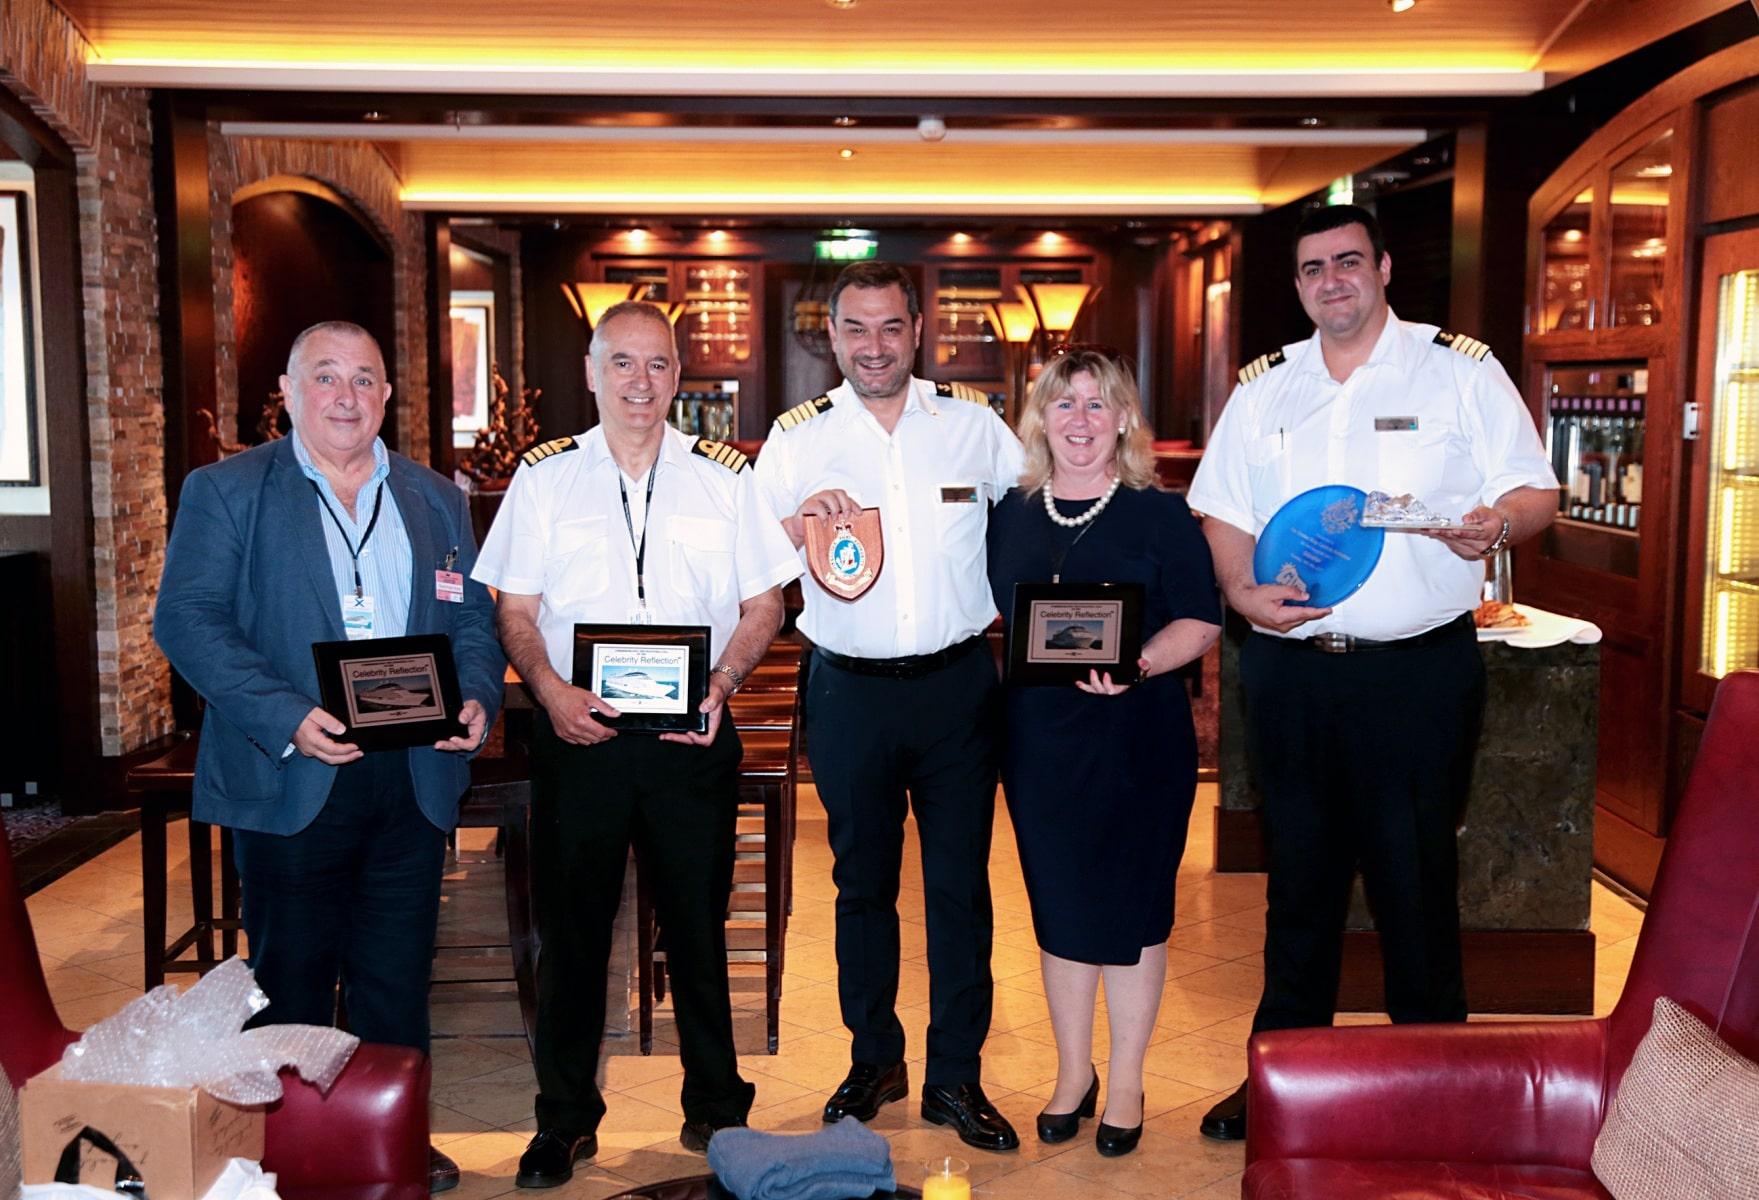 08-may-2017-39visita-inaugural-del-crucero-celebrity-or-reflection-a-gibraltar_33895384554_o